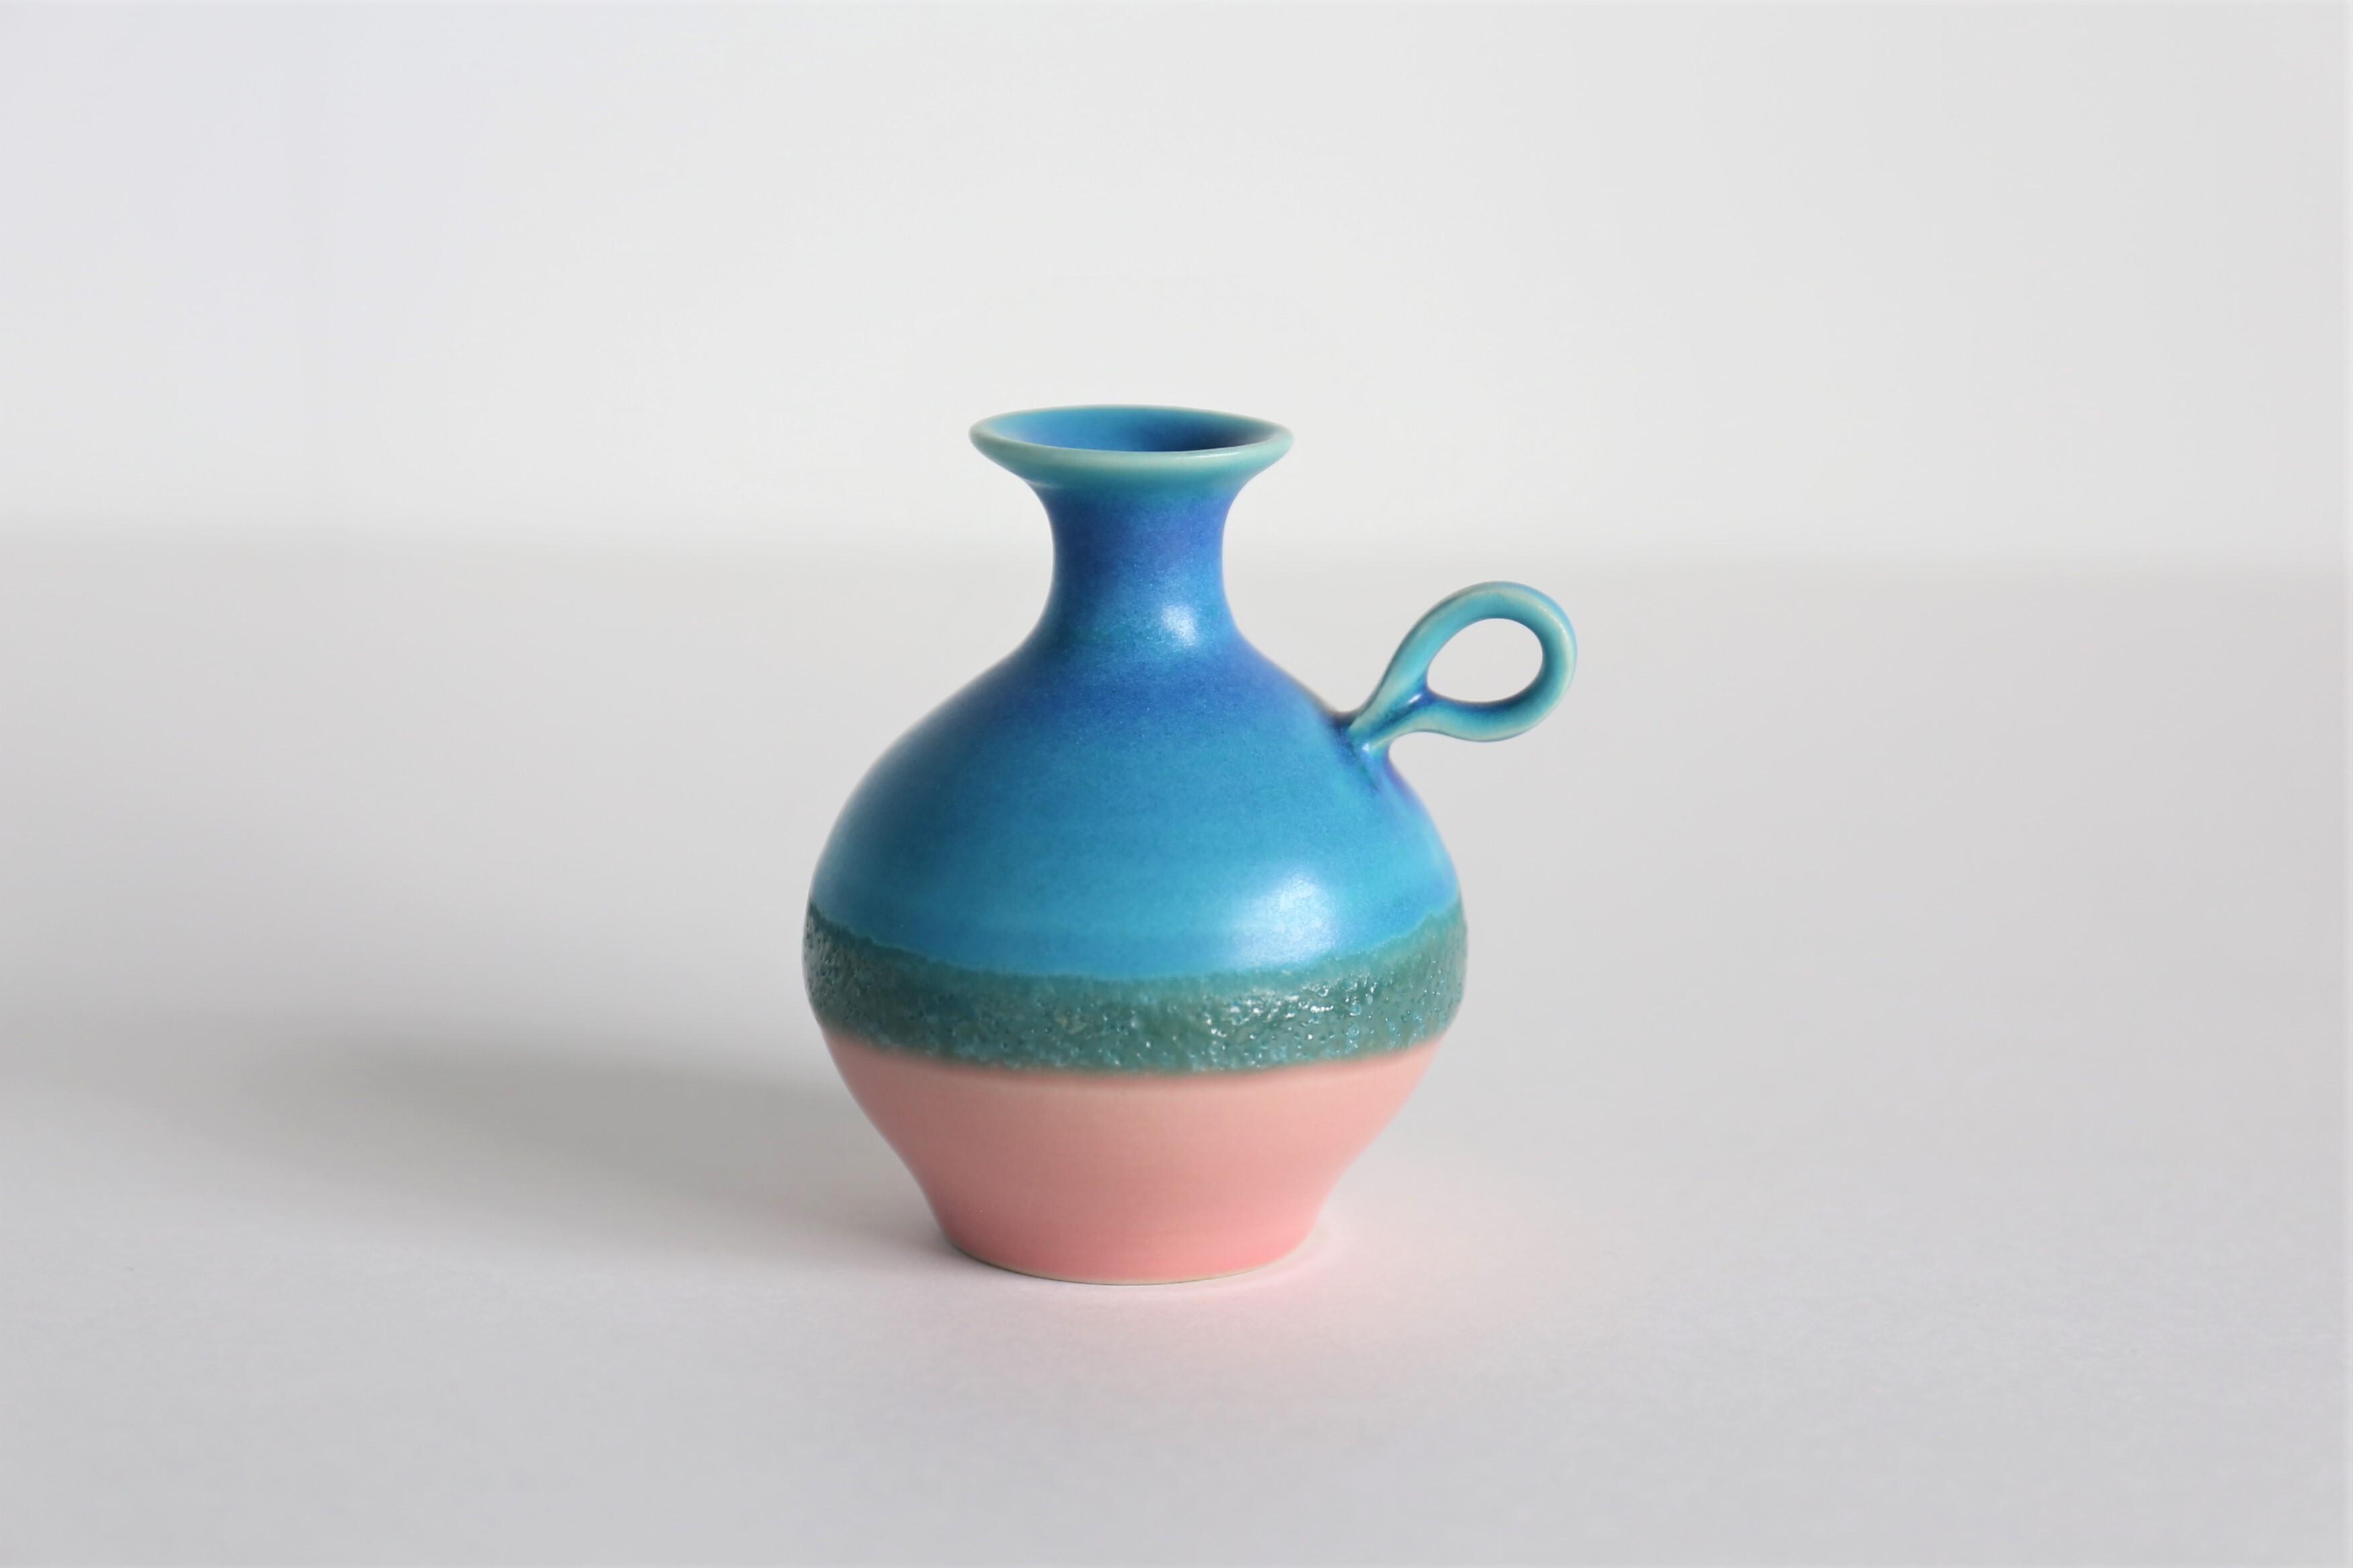 wakako ceramics/坂本和歌子  はねつきいちりん